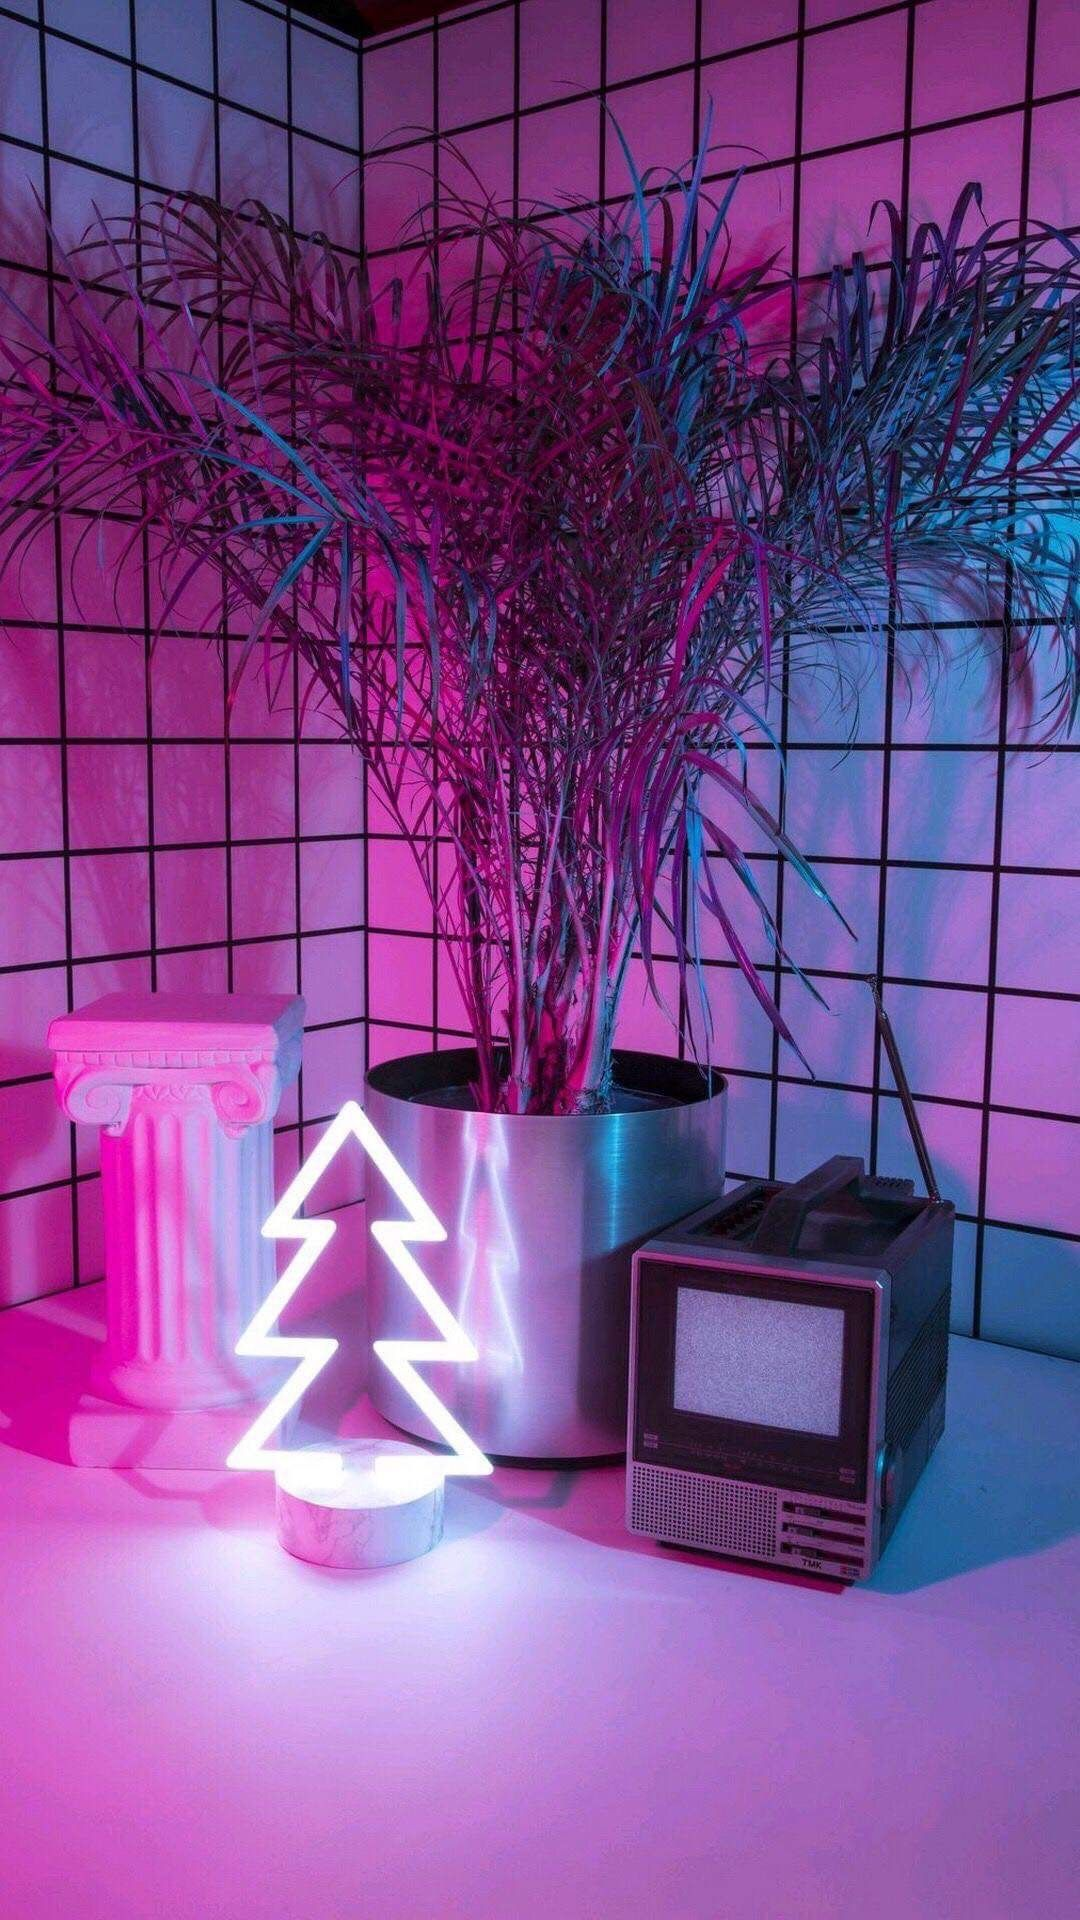 Pin oleh HaHa🥀 di Forever |  Pencahayaan Neon, Estetika Neon ...